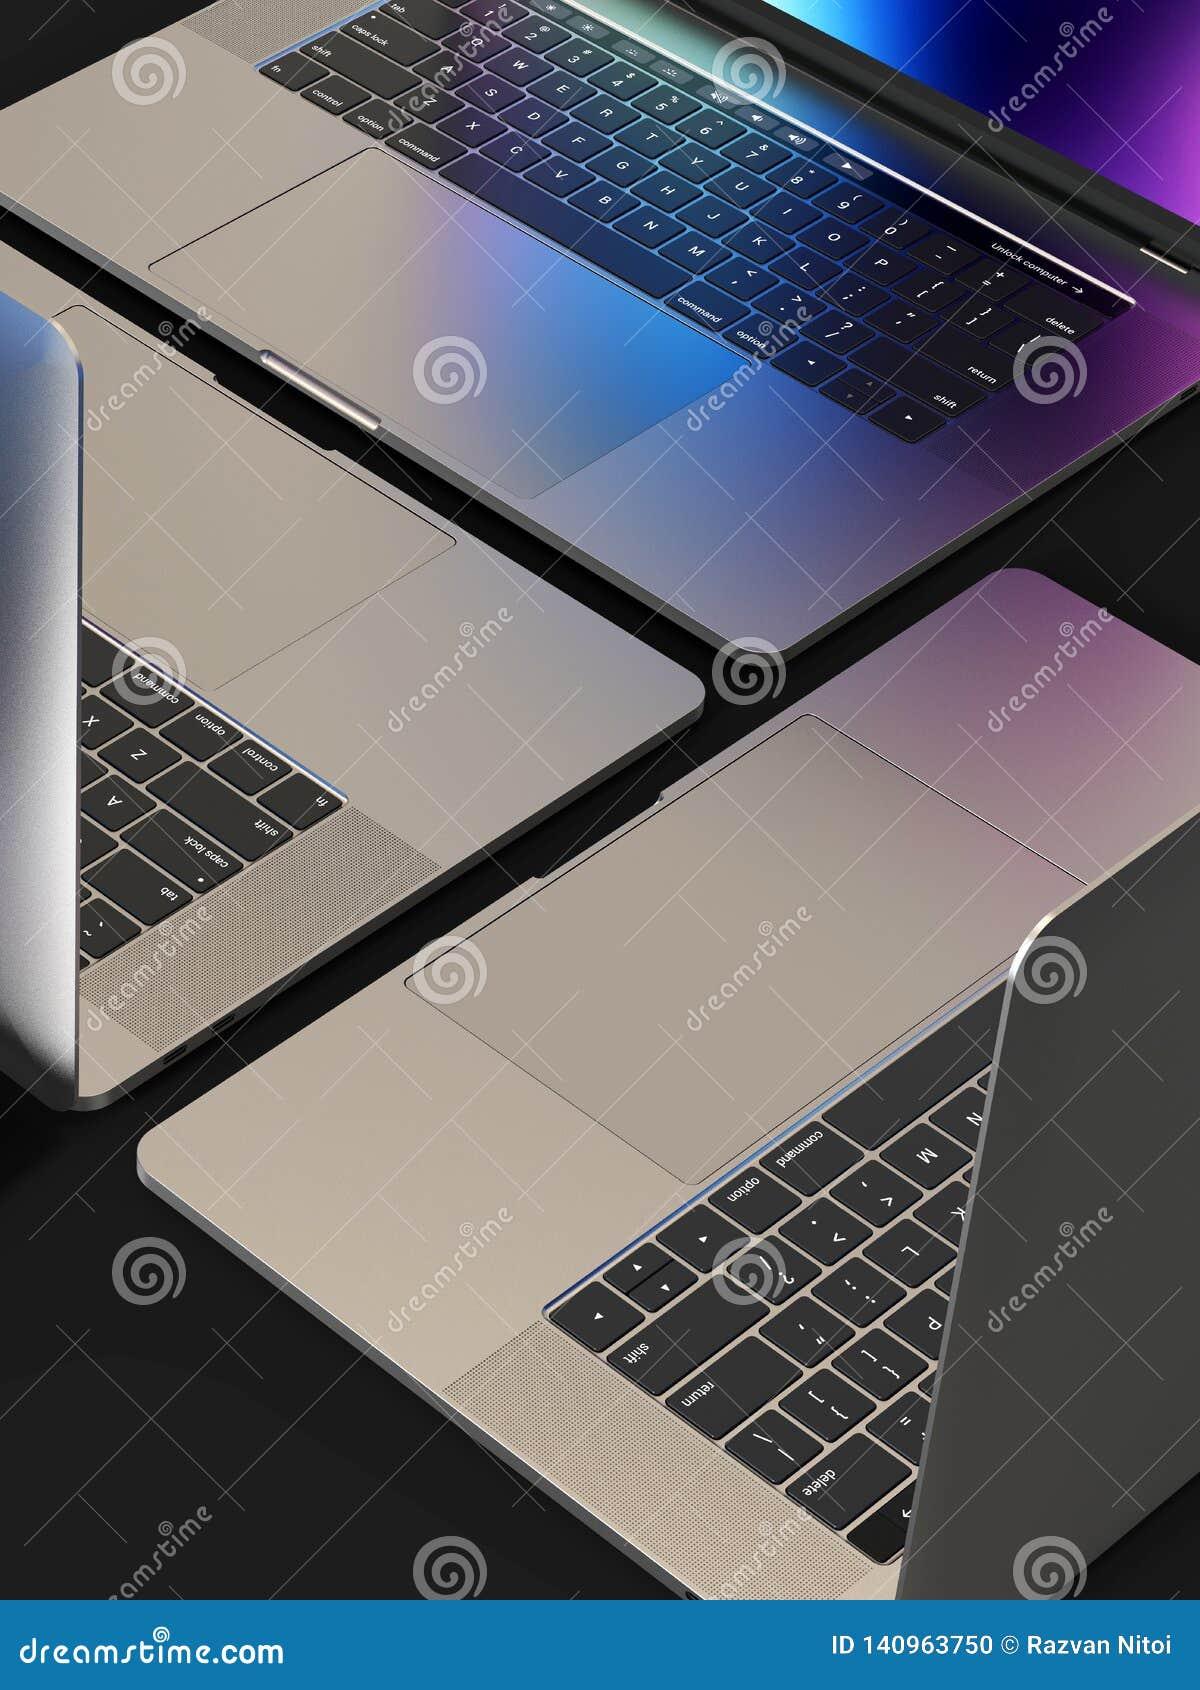 MacBook Pro style laptop computers, composition